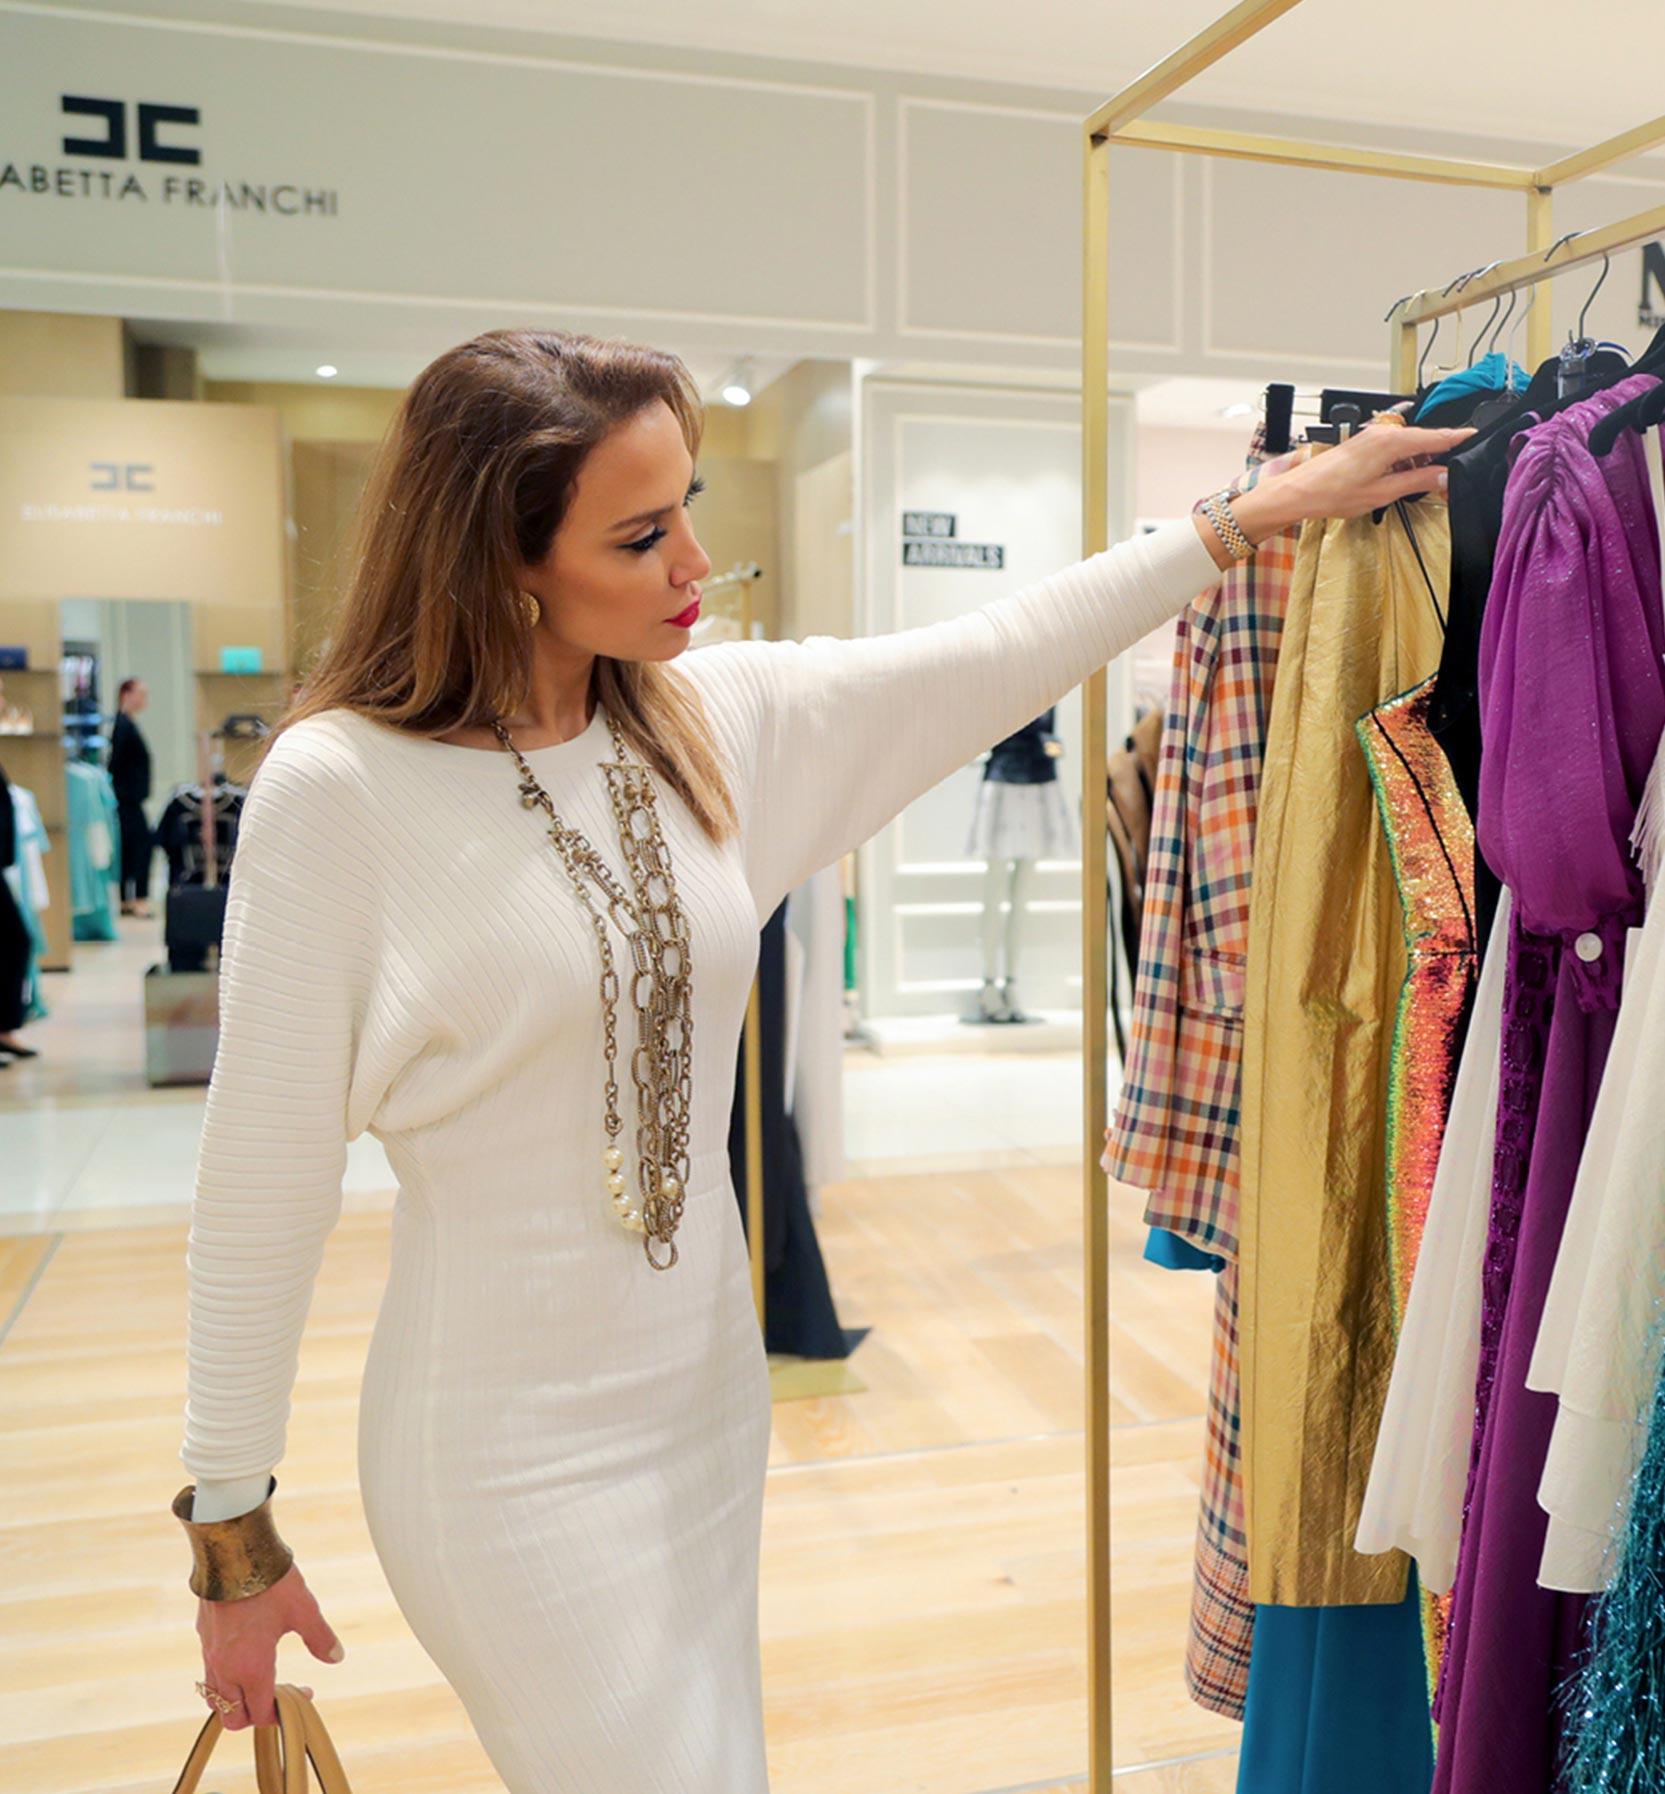 personal shopper training dubai mall